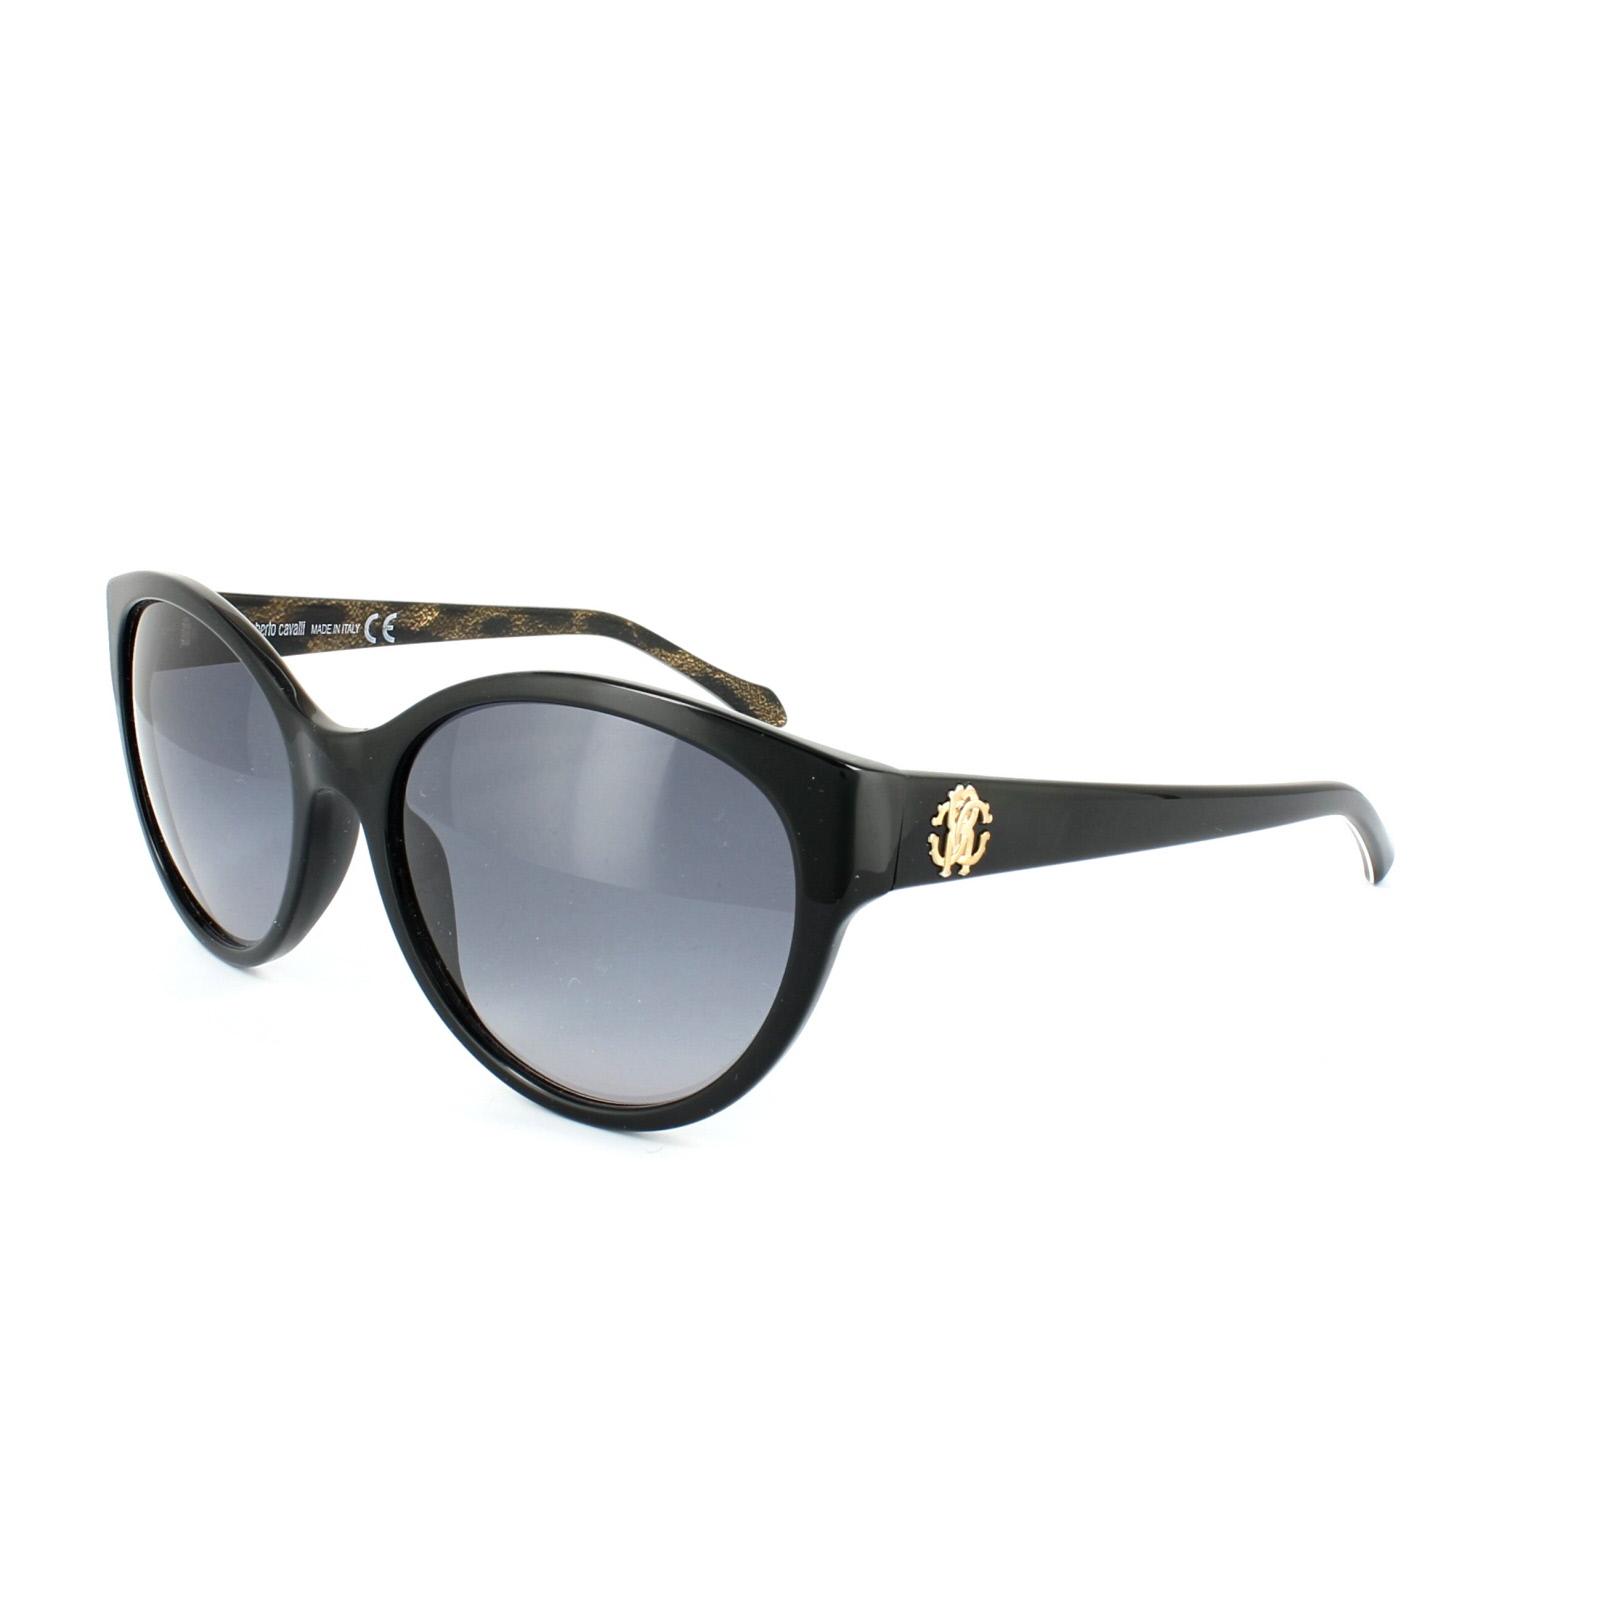 1914e79a40 CENTINELA Roberto Cavalli gafas de sol 05B Alrischa 824 degradado brillante  negro gris